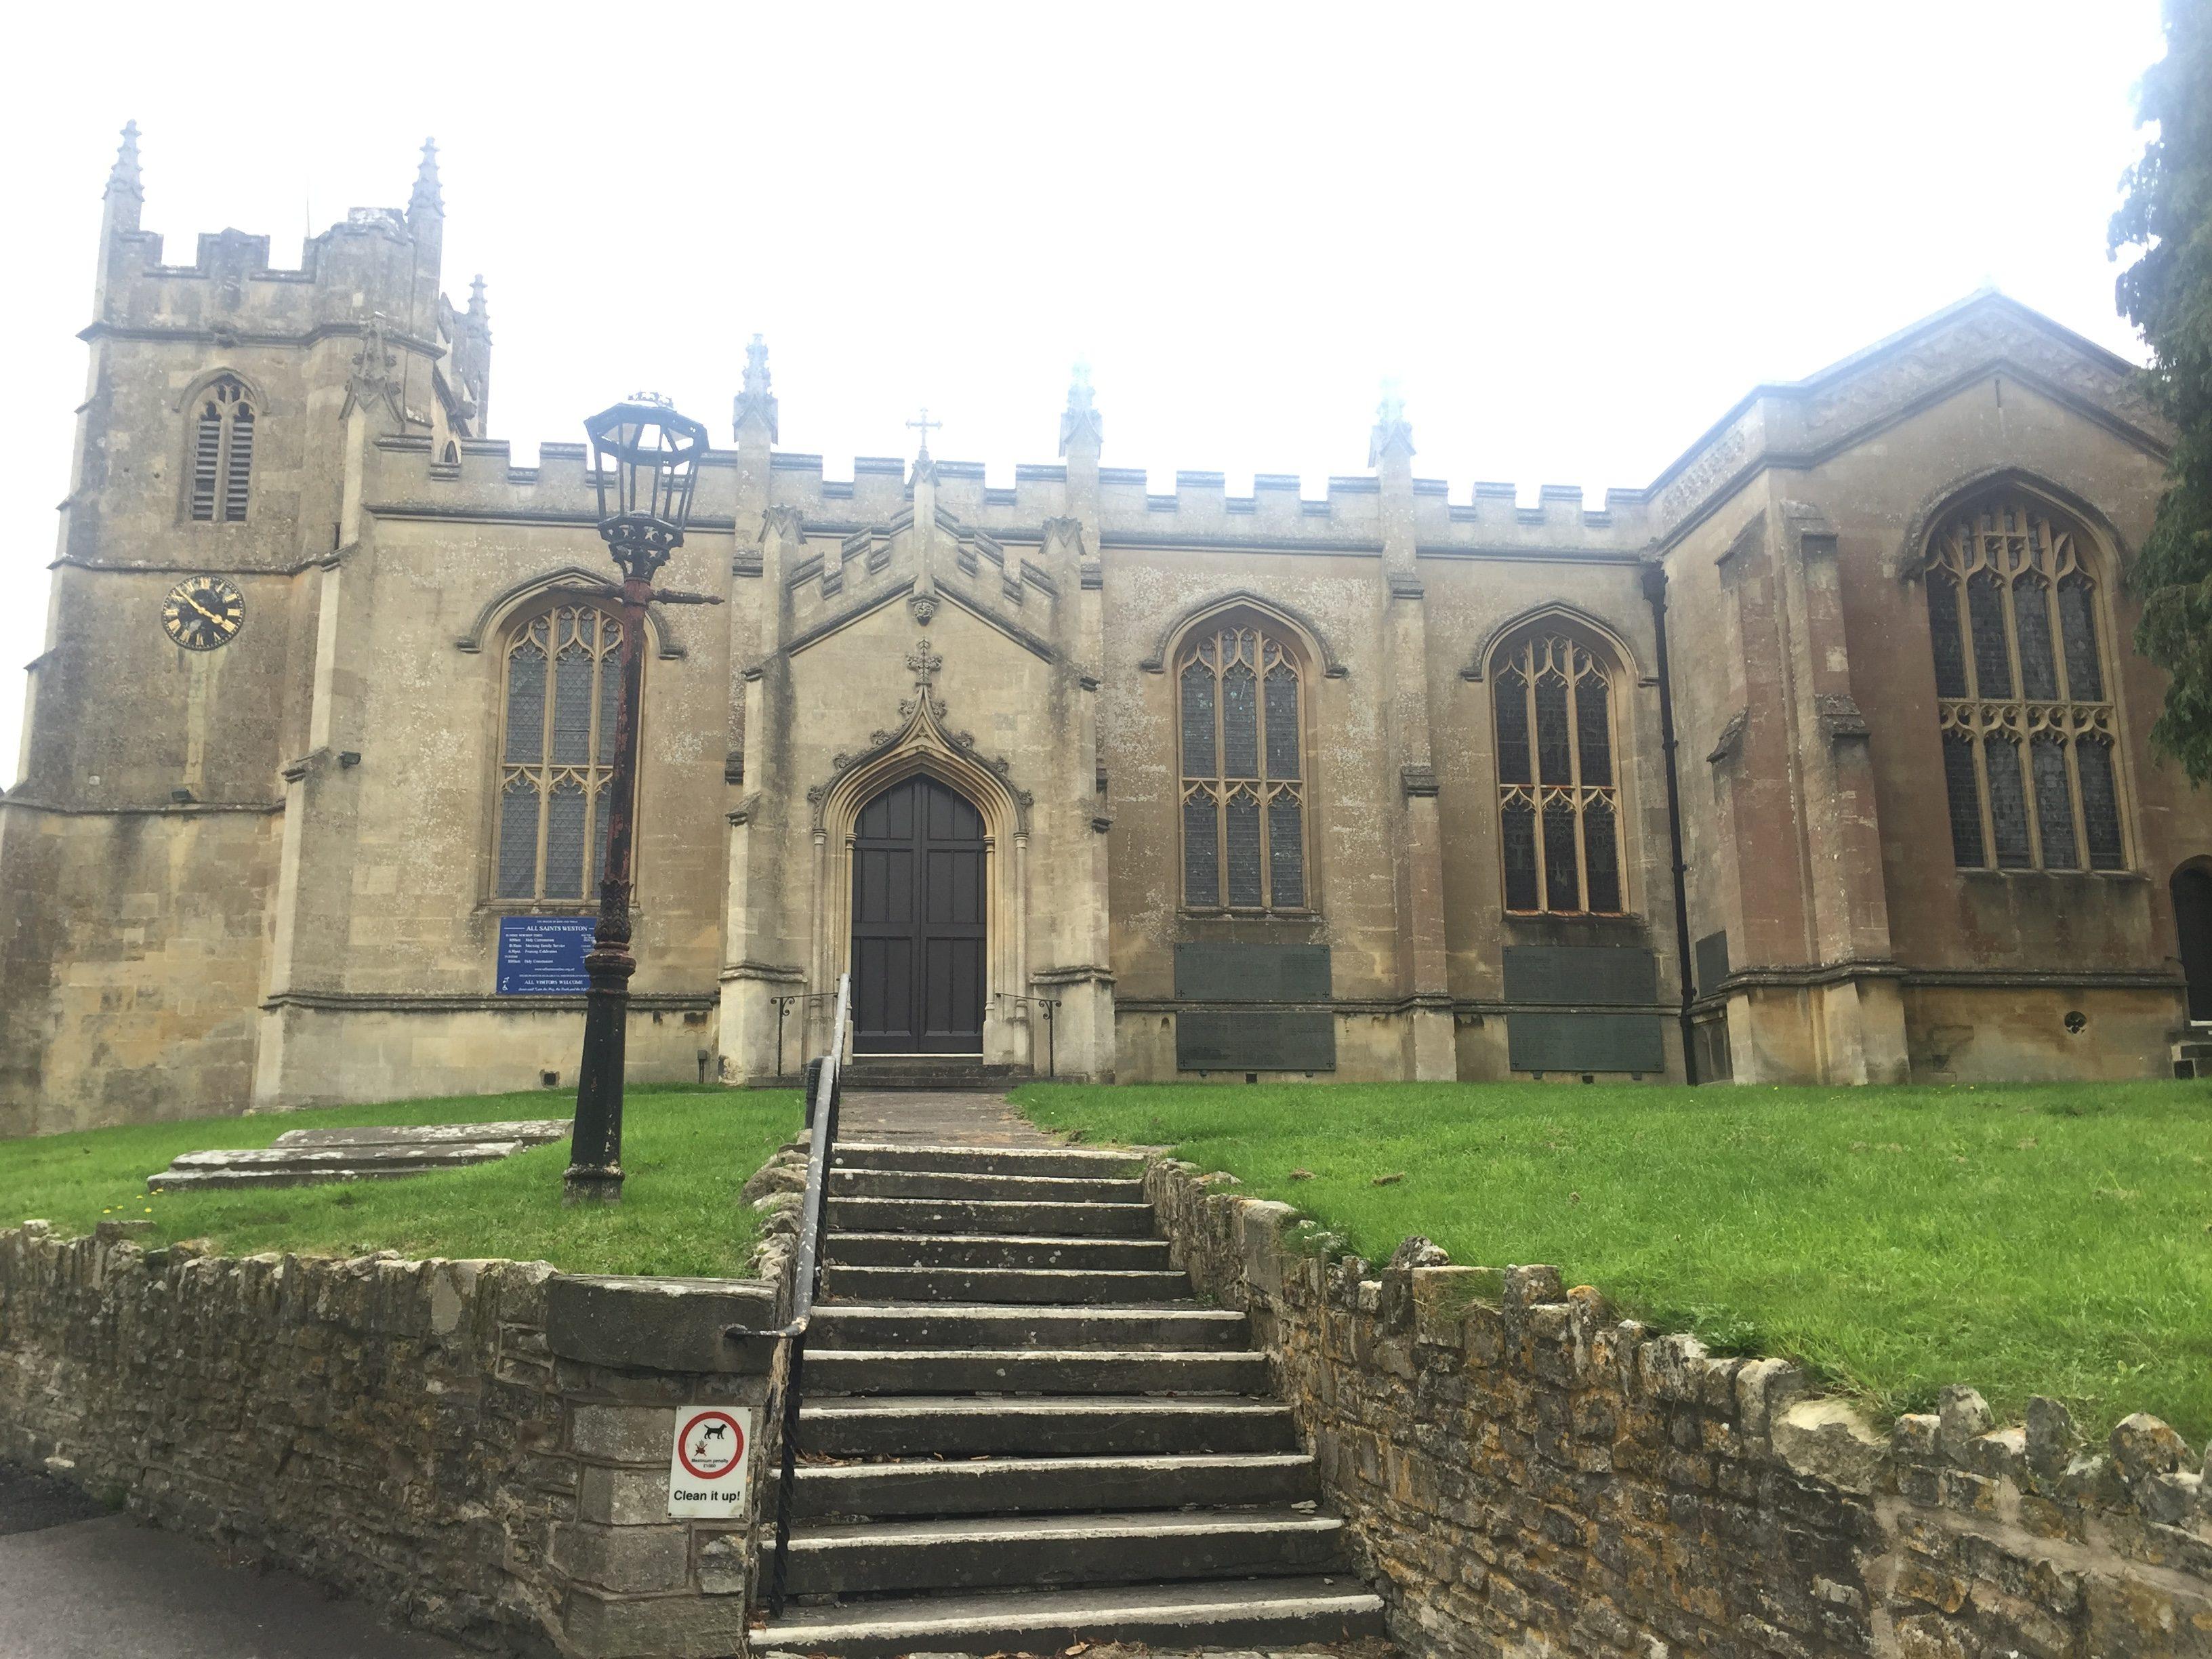 All Saints, Weston, Bath 17.9.16